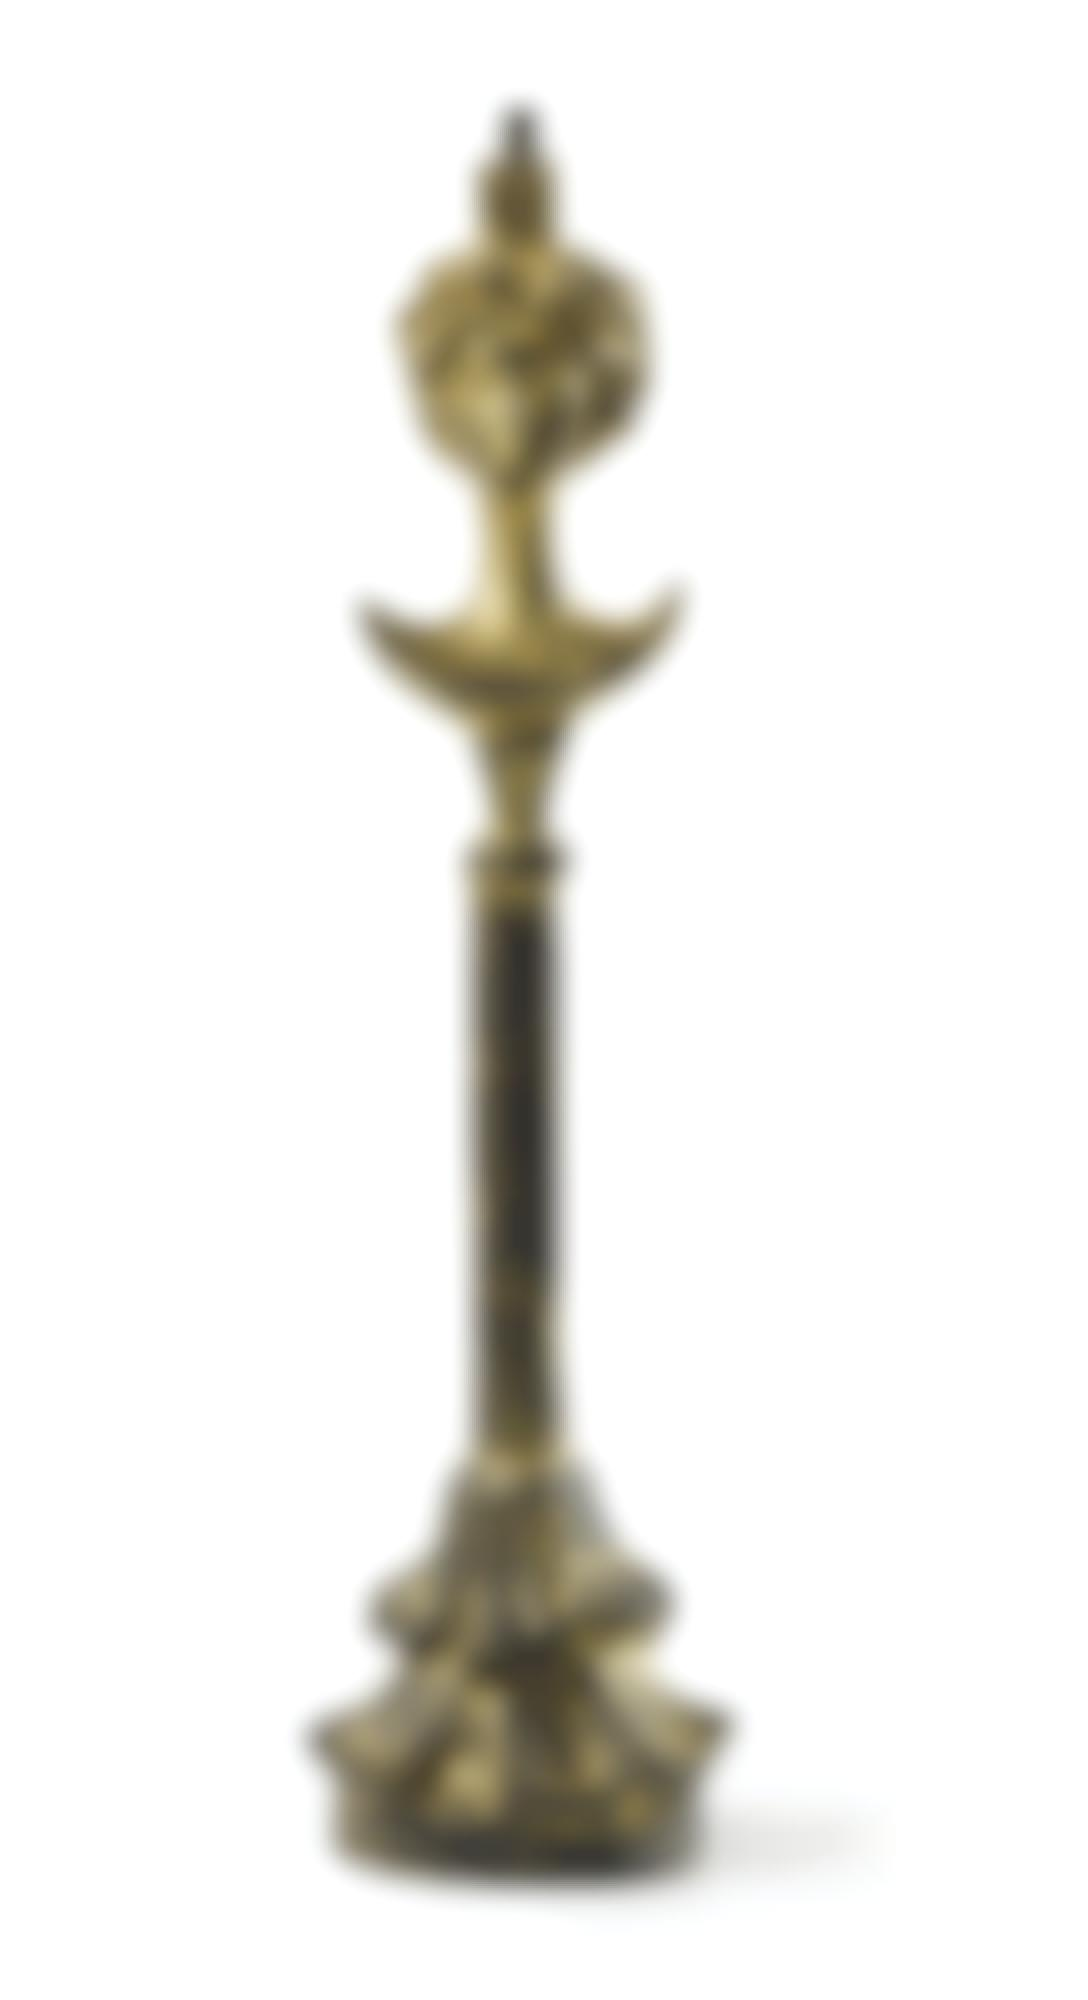 Syrie Maugham - Lampe Tete De Femme, D'Apres Le Modele D'Alberto Giacometti-1940